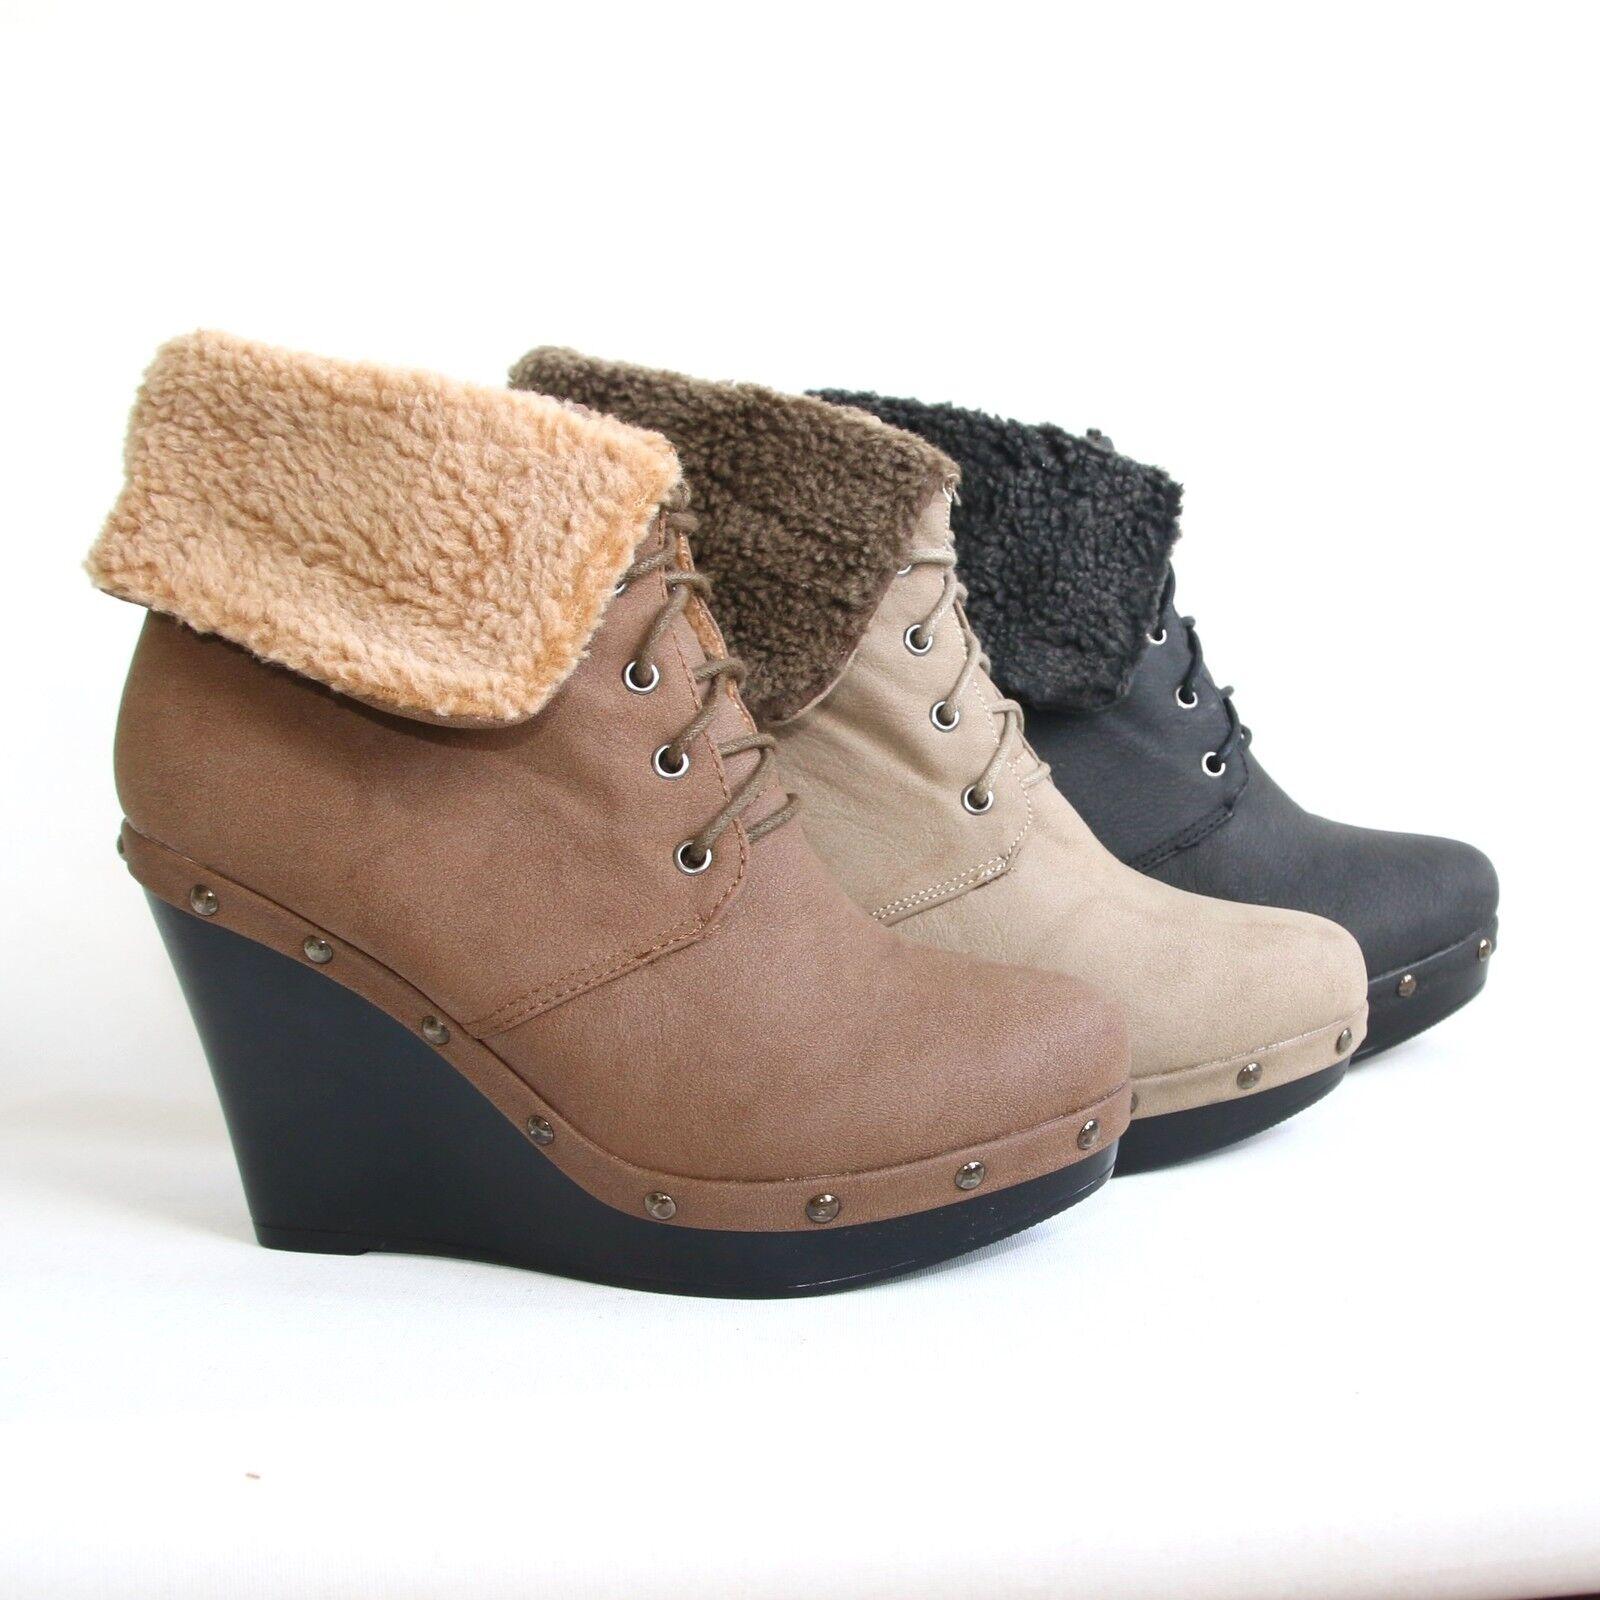 Damen Plateau Stiefeletten Keilabsatz Halbschuhe Wedges Pumps Shoes A-18